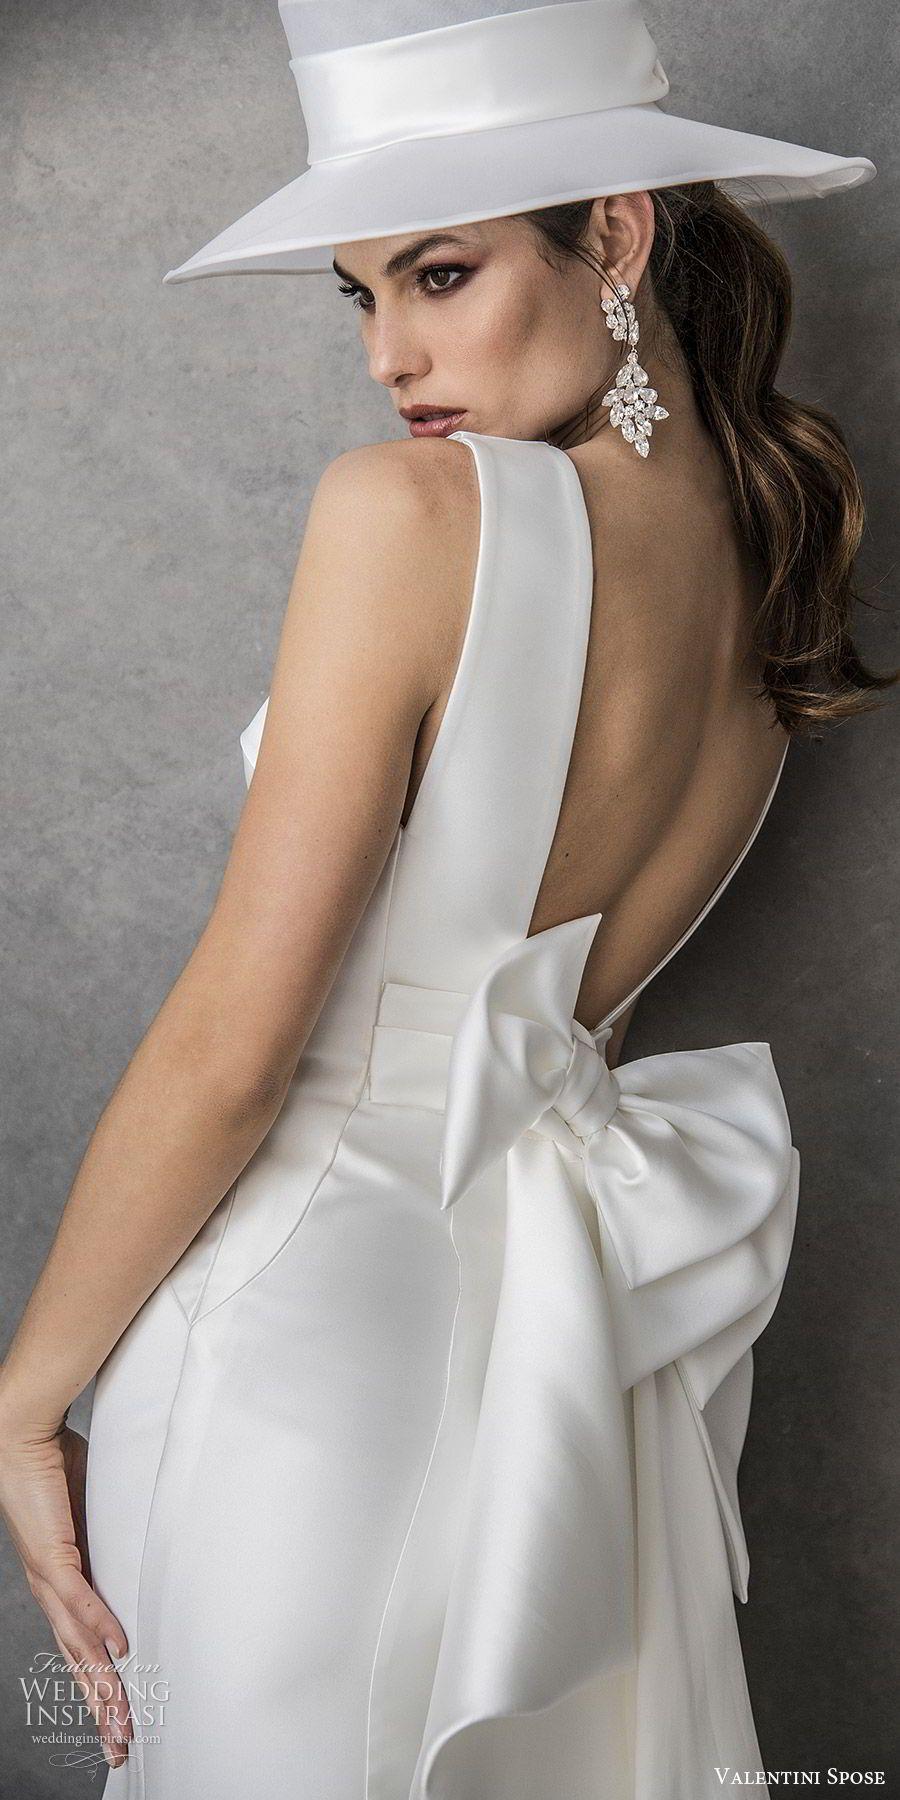 Valentini Spose Spring 2020 Wedding Dresses Wedding Inspirasi Indian Wedding Dress V Neck Wedding Dress Bridal Dresses